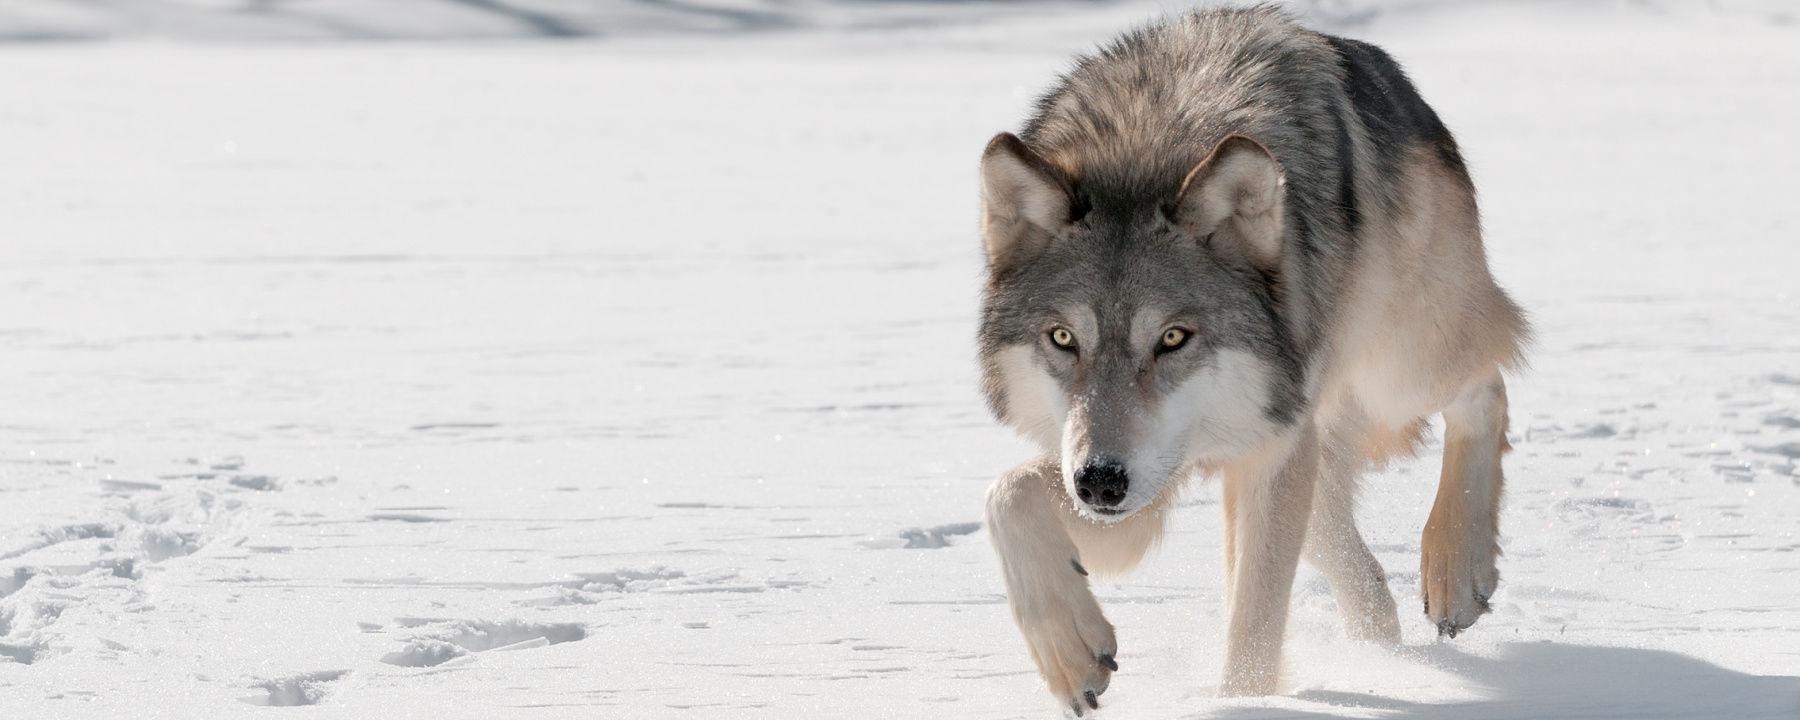 Gray Wolf Reintroduction in Colorado Encounters Federal Kerfuffle